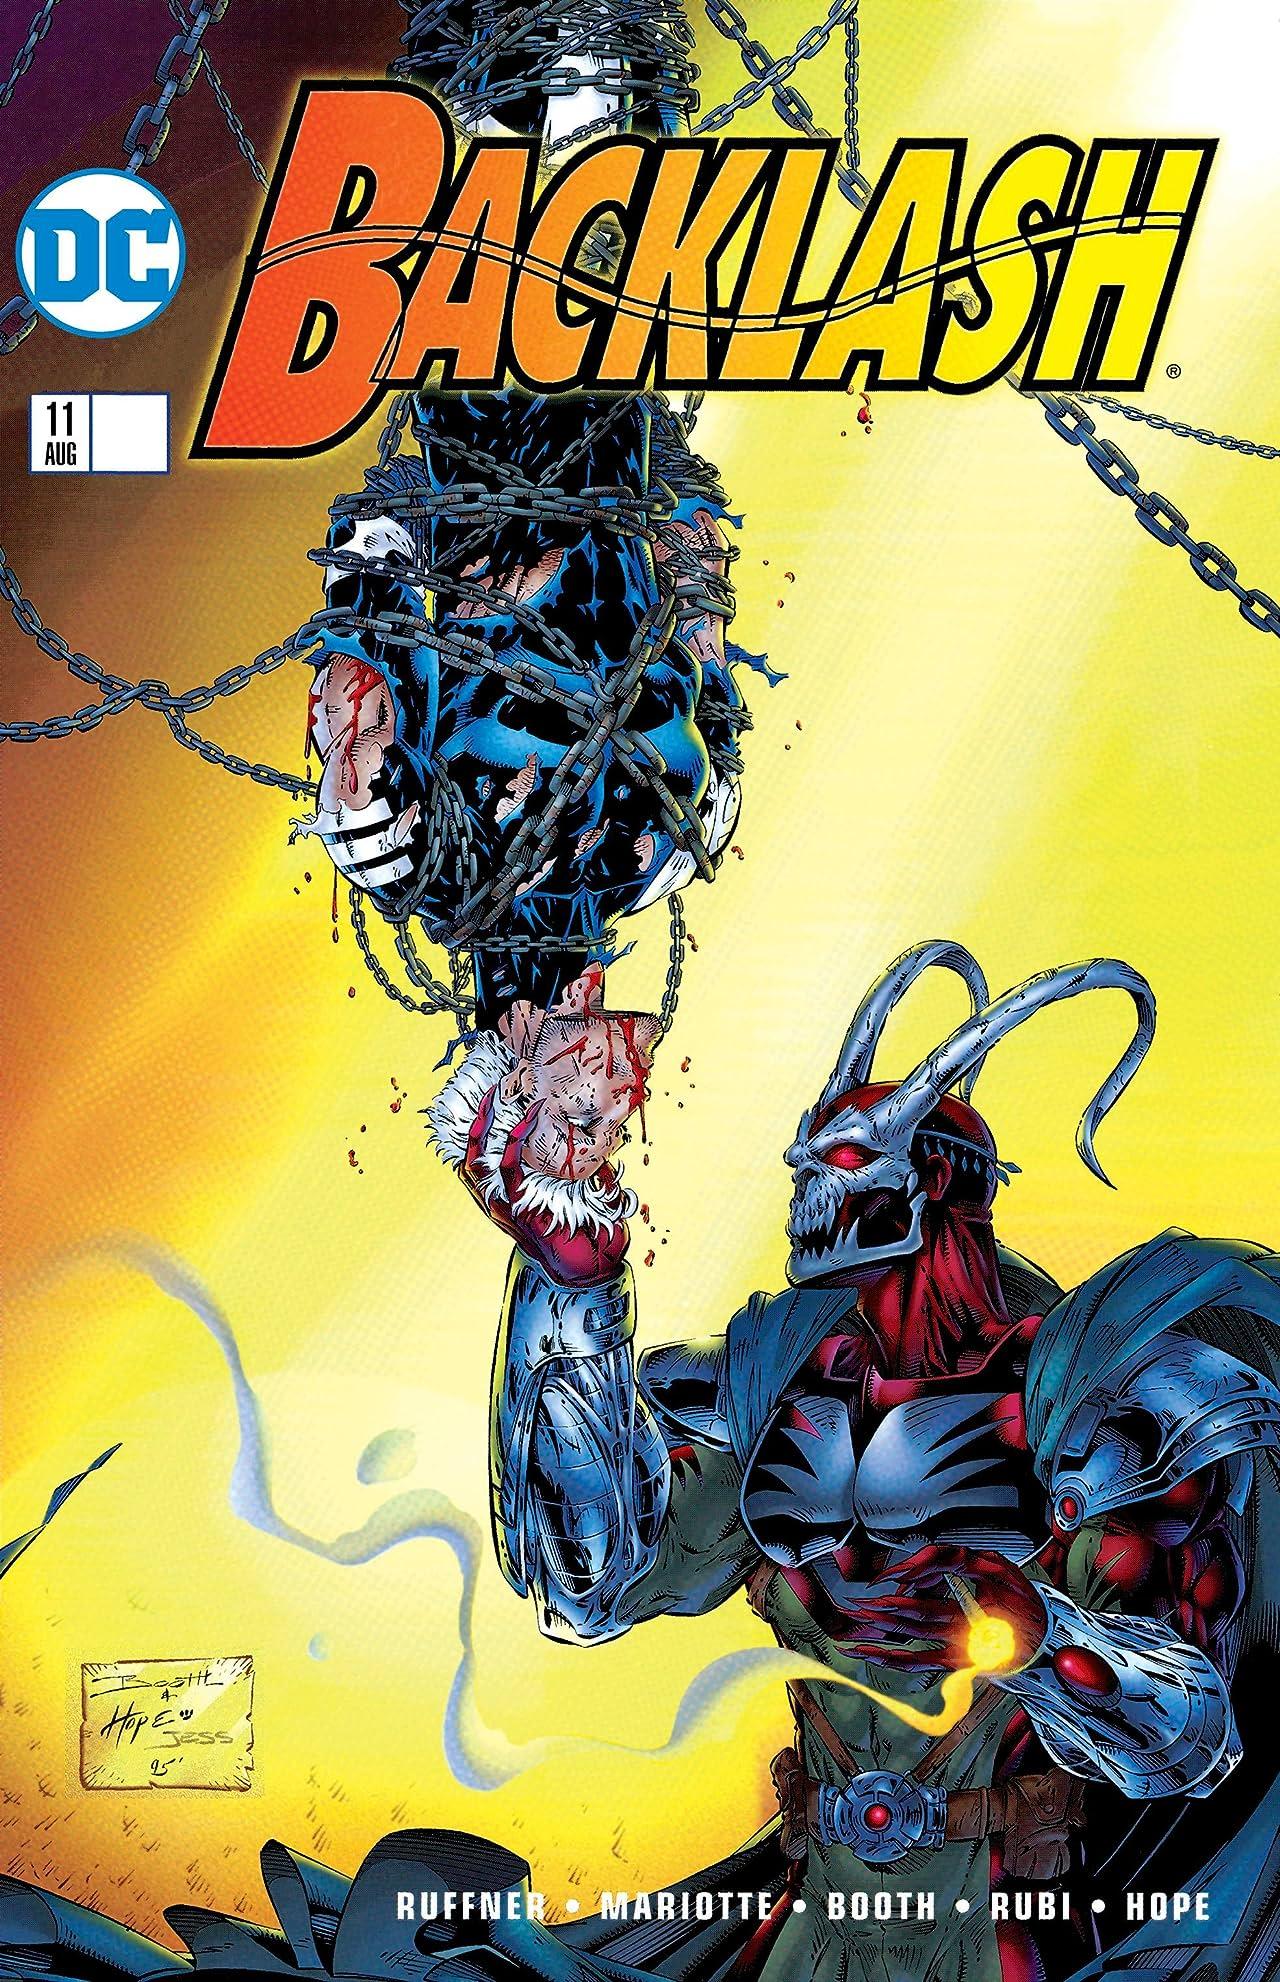 Backlash (1994-1997) #11